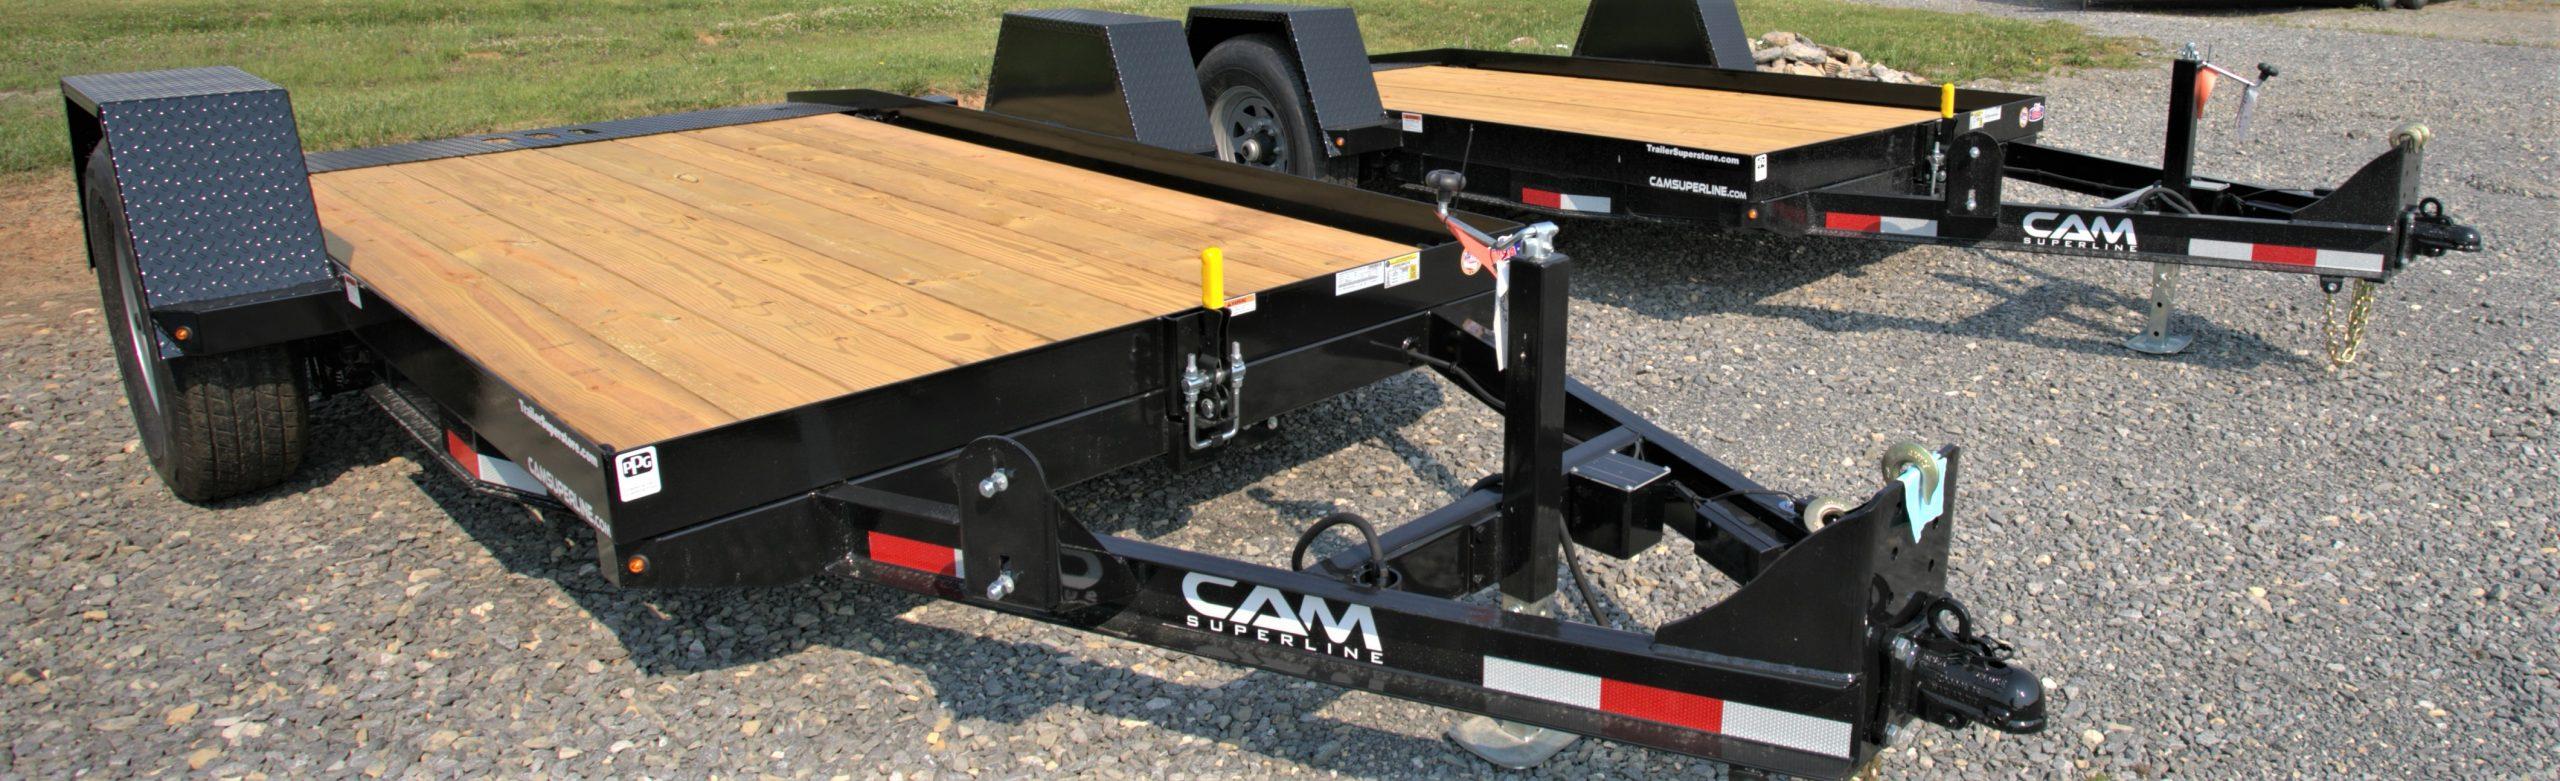 Cam Superline Trailers